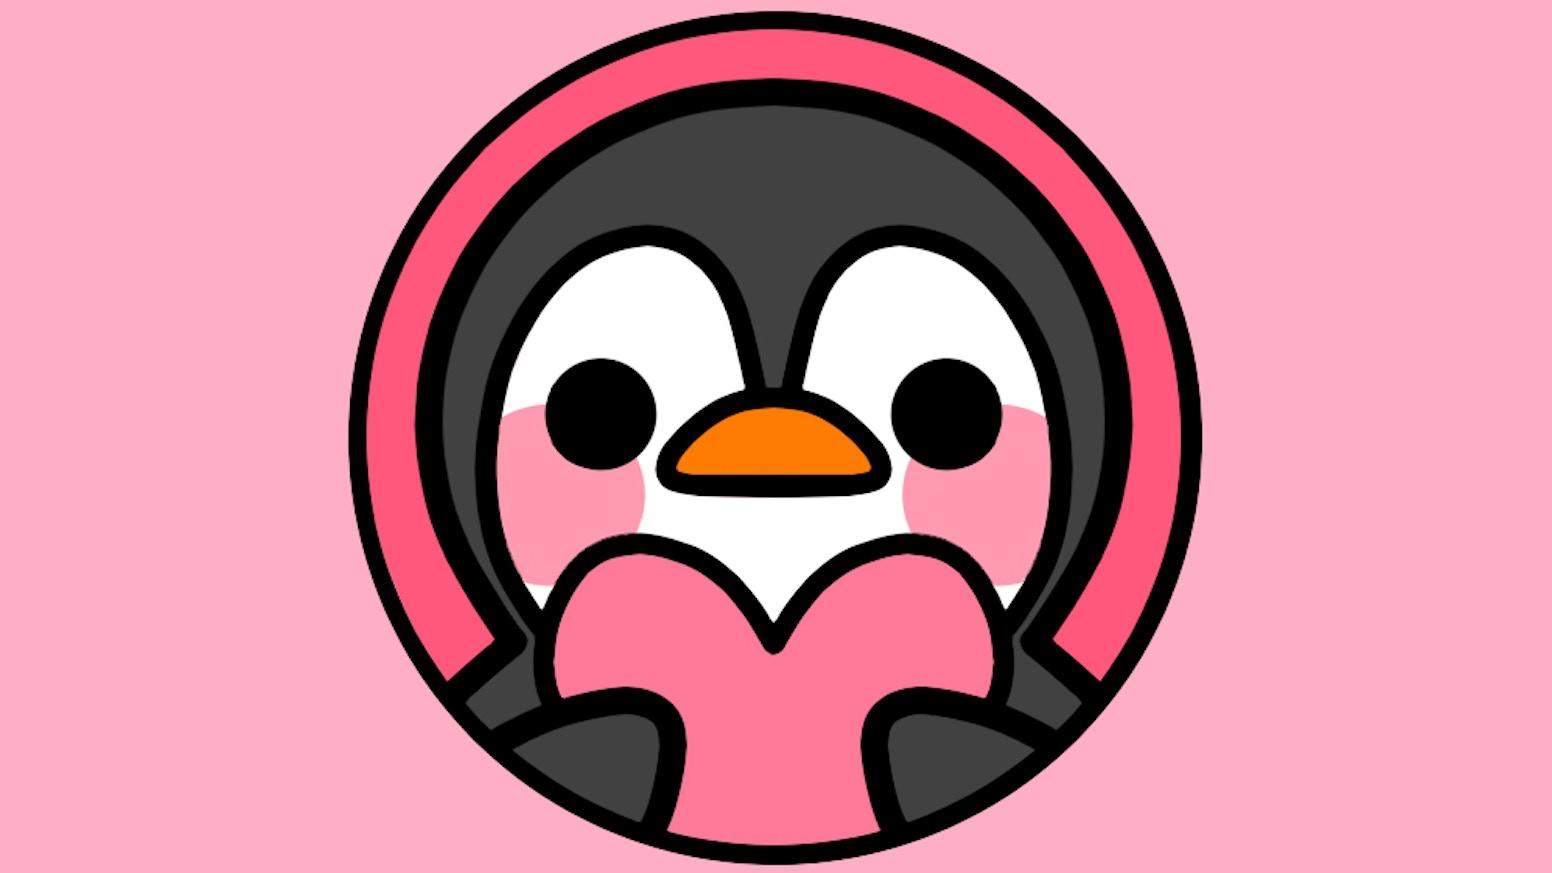 789b64b5d59 PINGKI - Cute  Penguin Love  Enamel Pin by Kyahri — Kickstarter